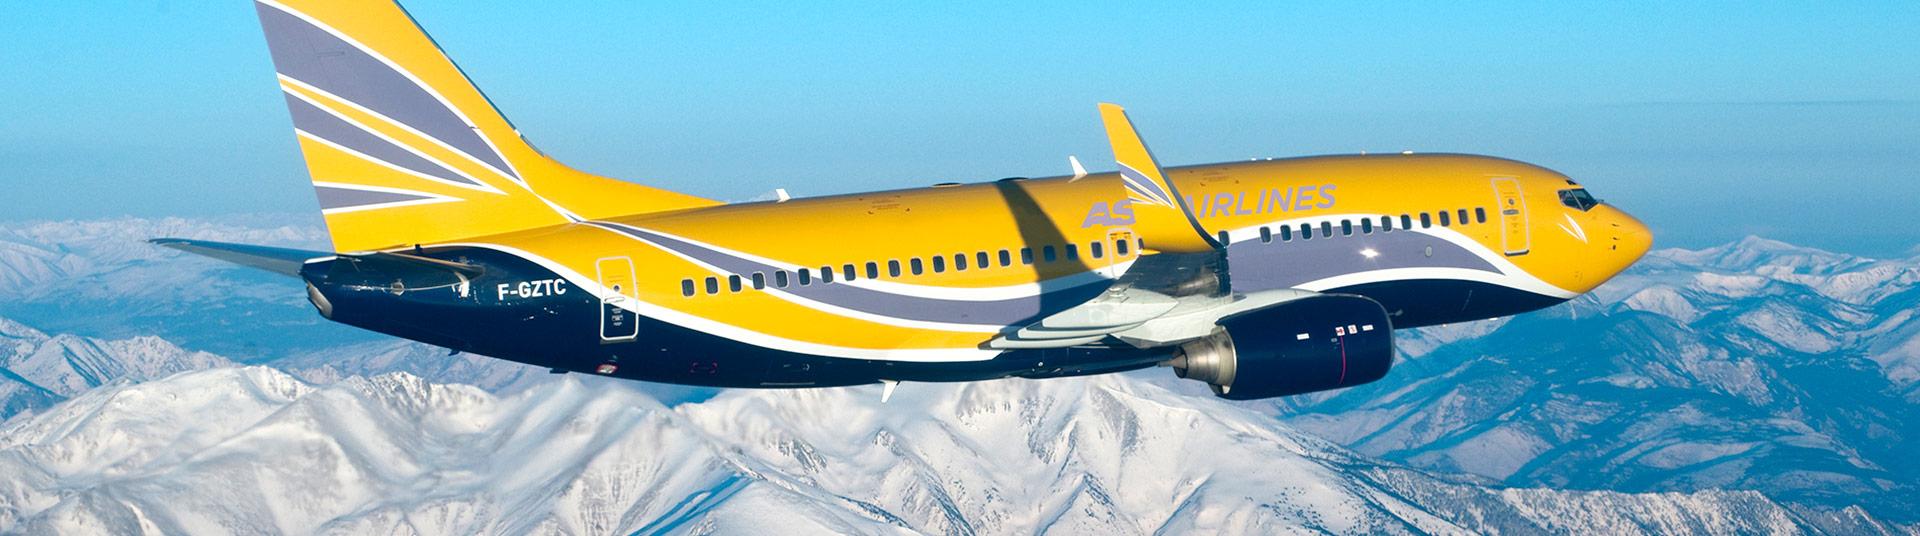 Asl airlines france 5o r servez un vol asl airlines for Air madagascar vol interieur horaire